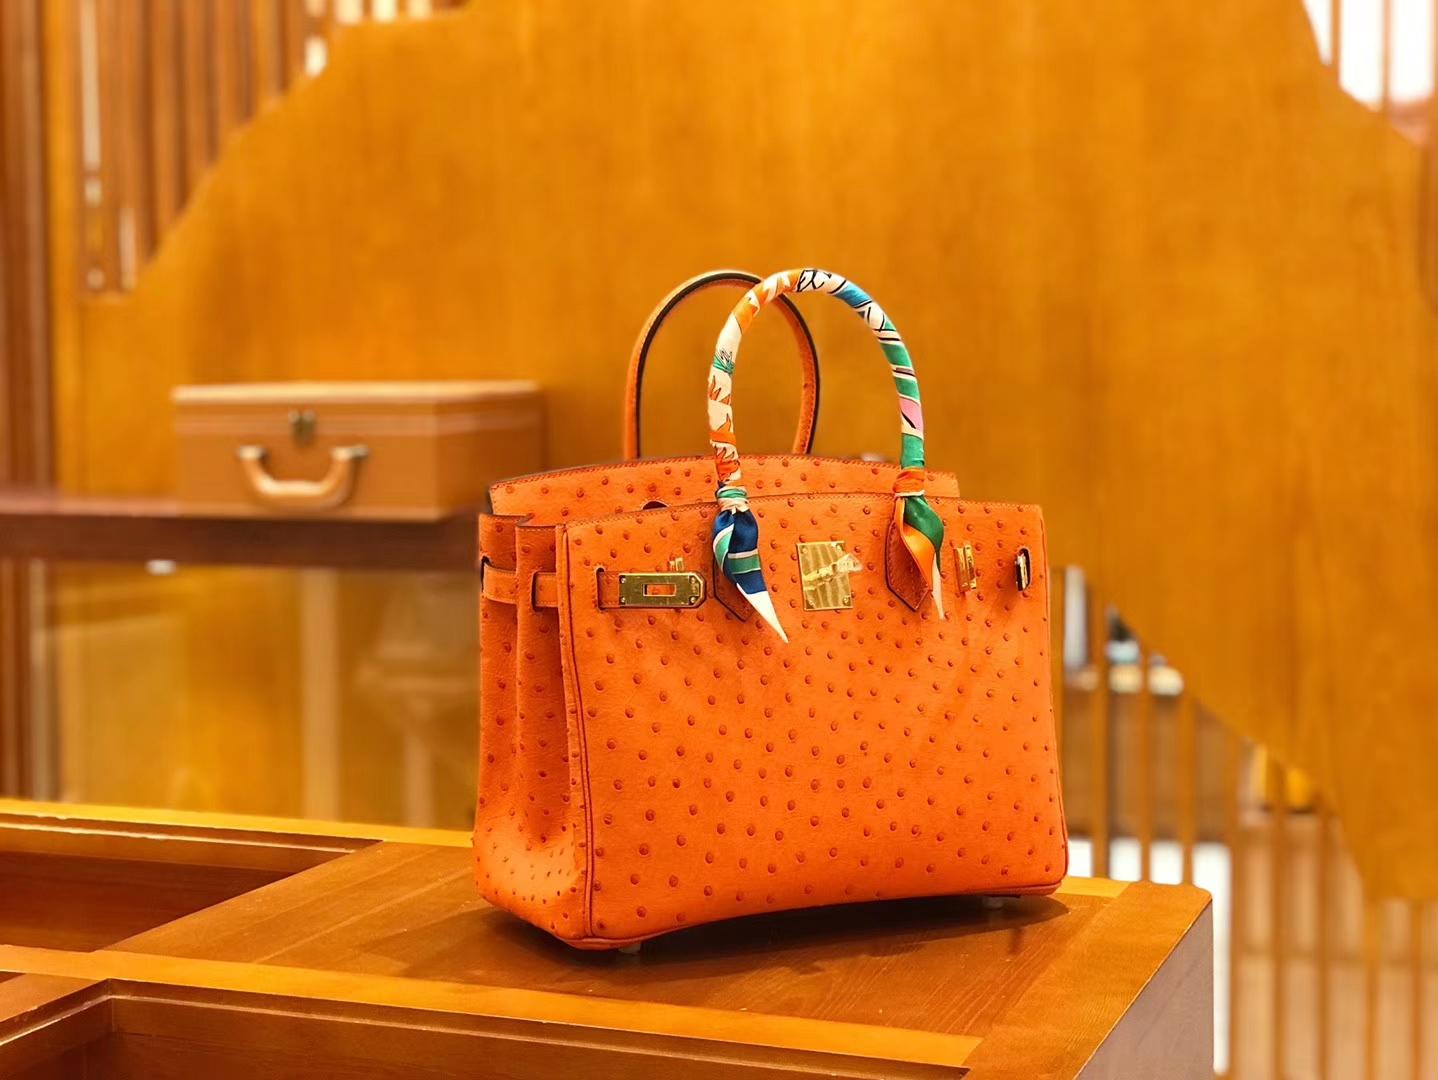 Hermès(爱马仕)Birkin 30cm 经典橙 鸵鸟皮 全手工缝制